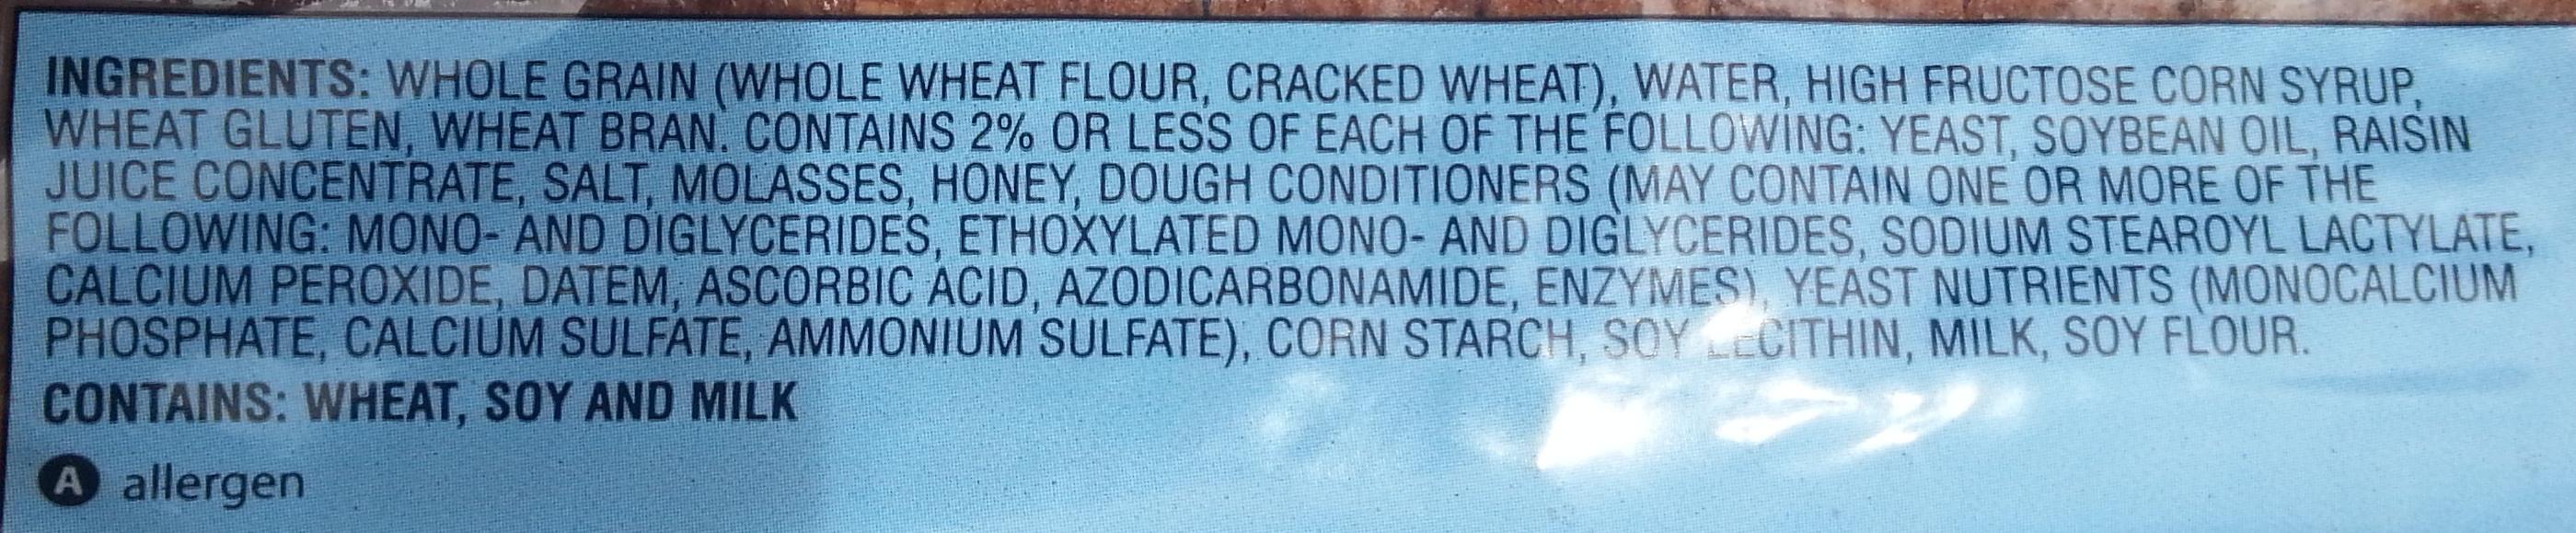 Sonoma 100% stone ground wheat bread - Ingredients